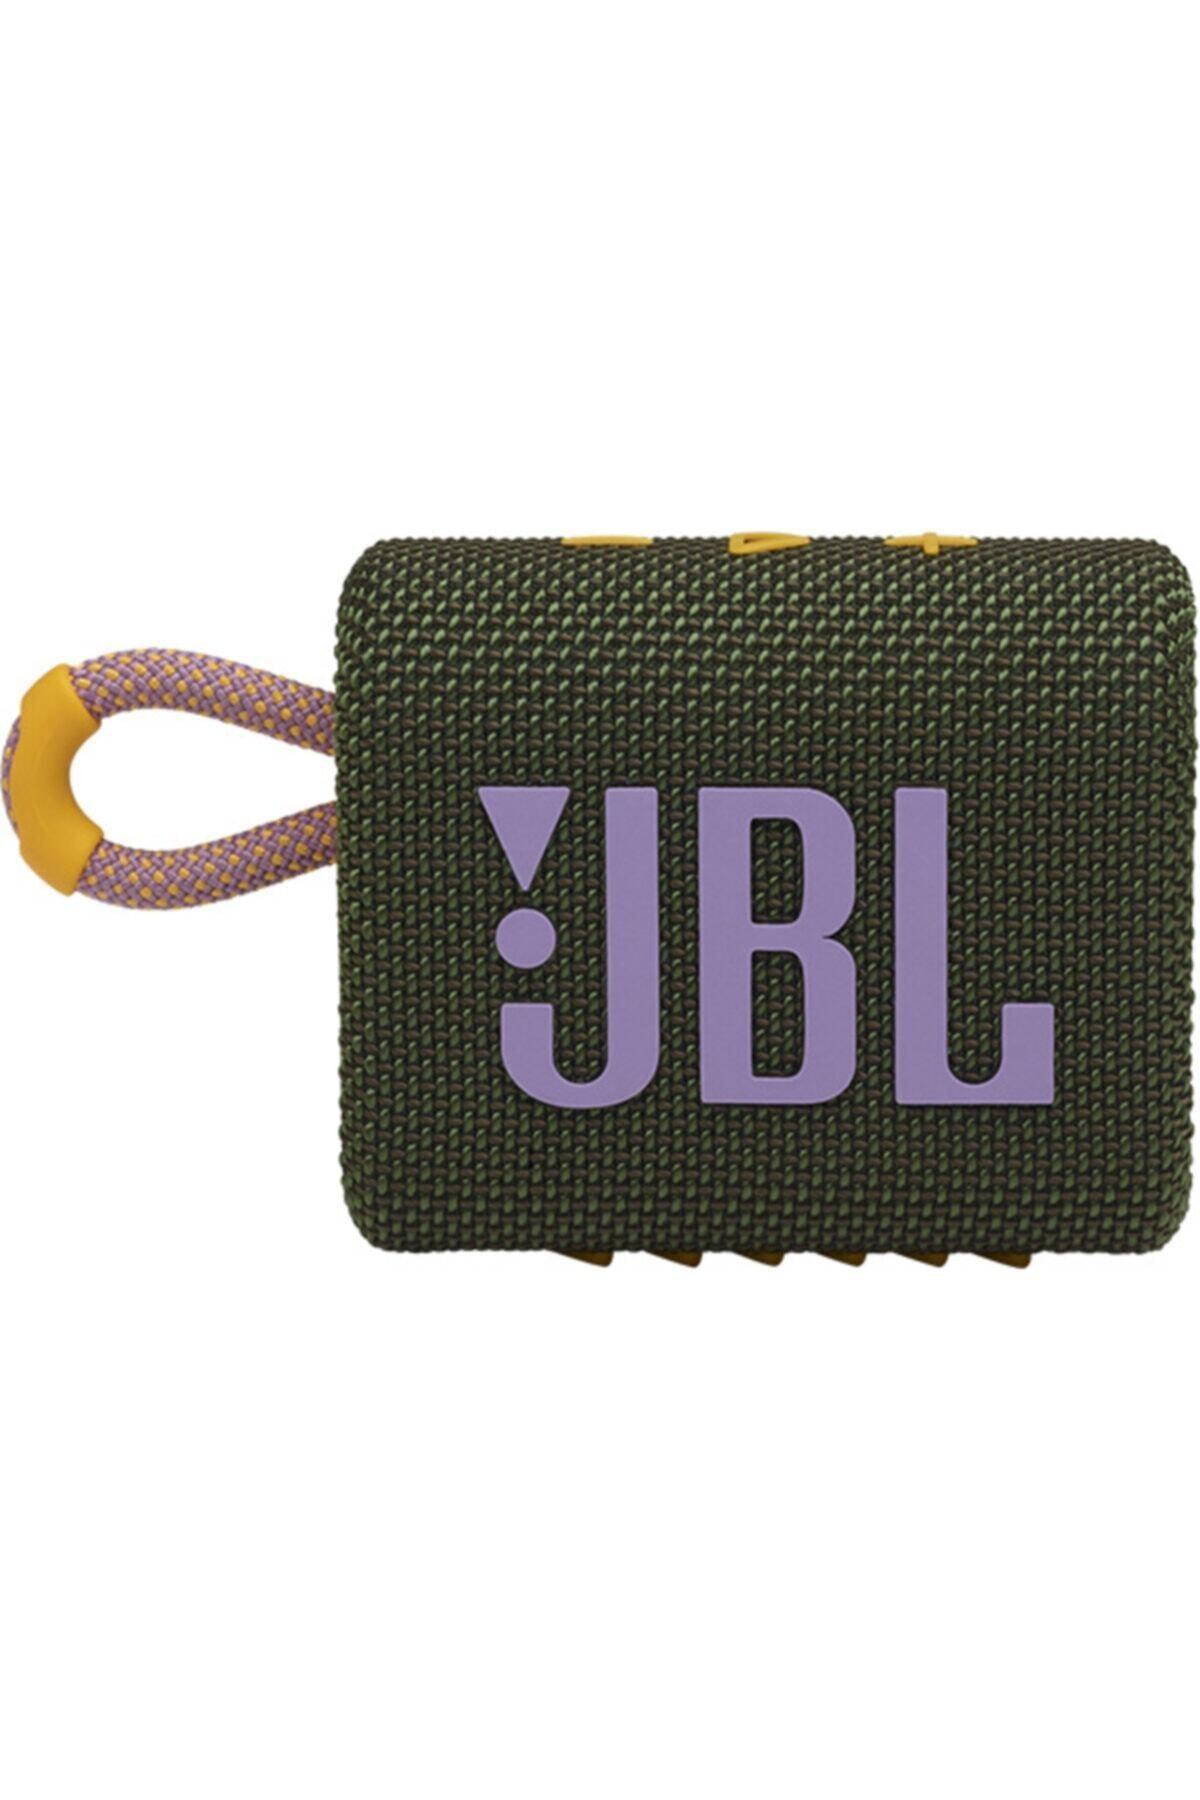 JBL Yeşil Go 3 Taşınabilir Bluetooth Hoparlör 2